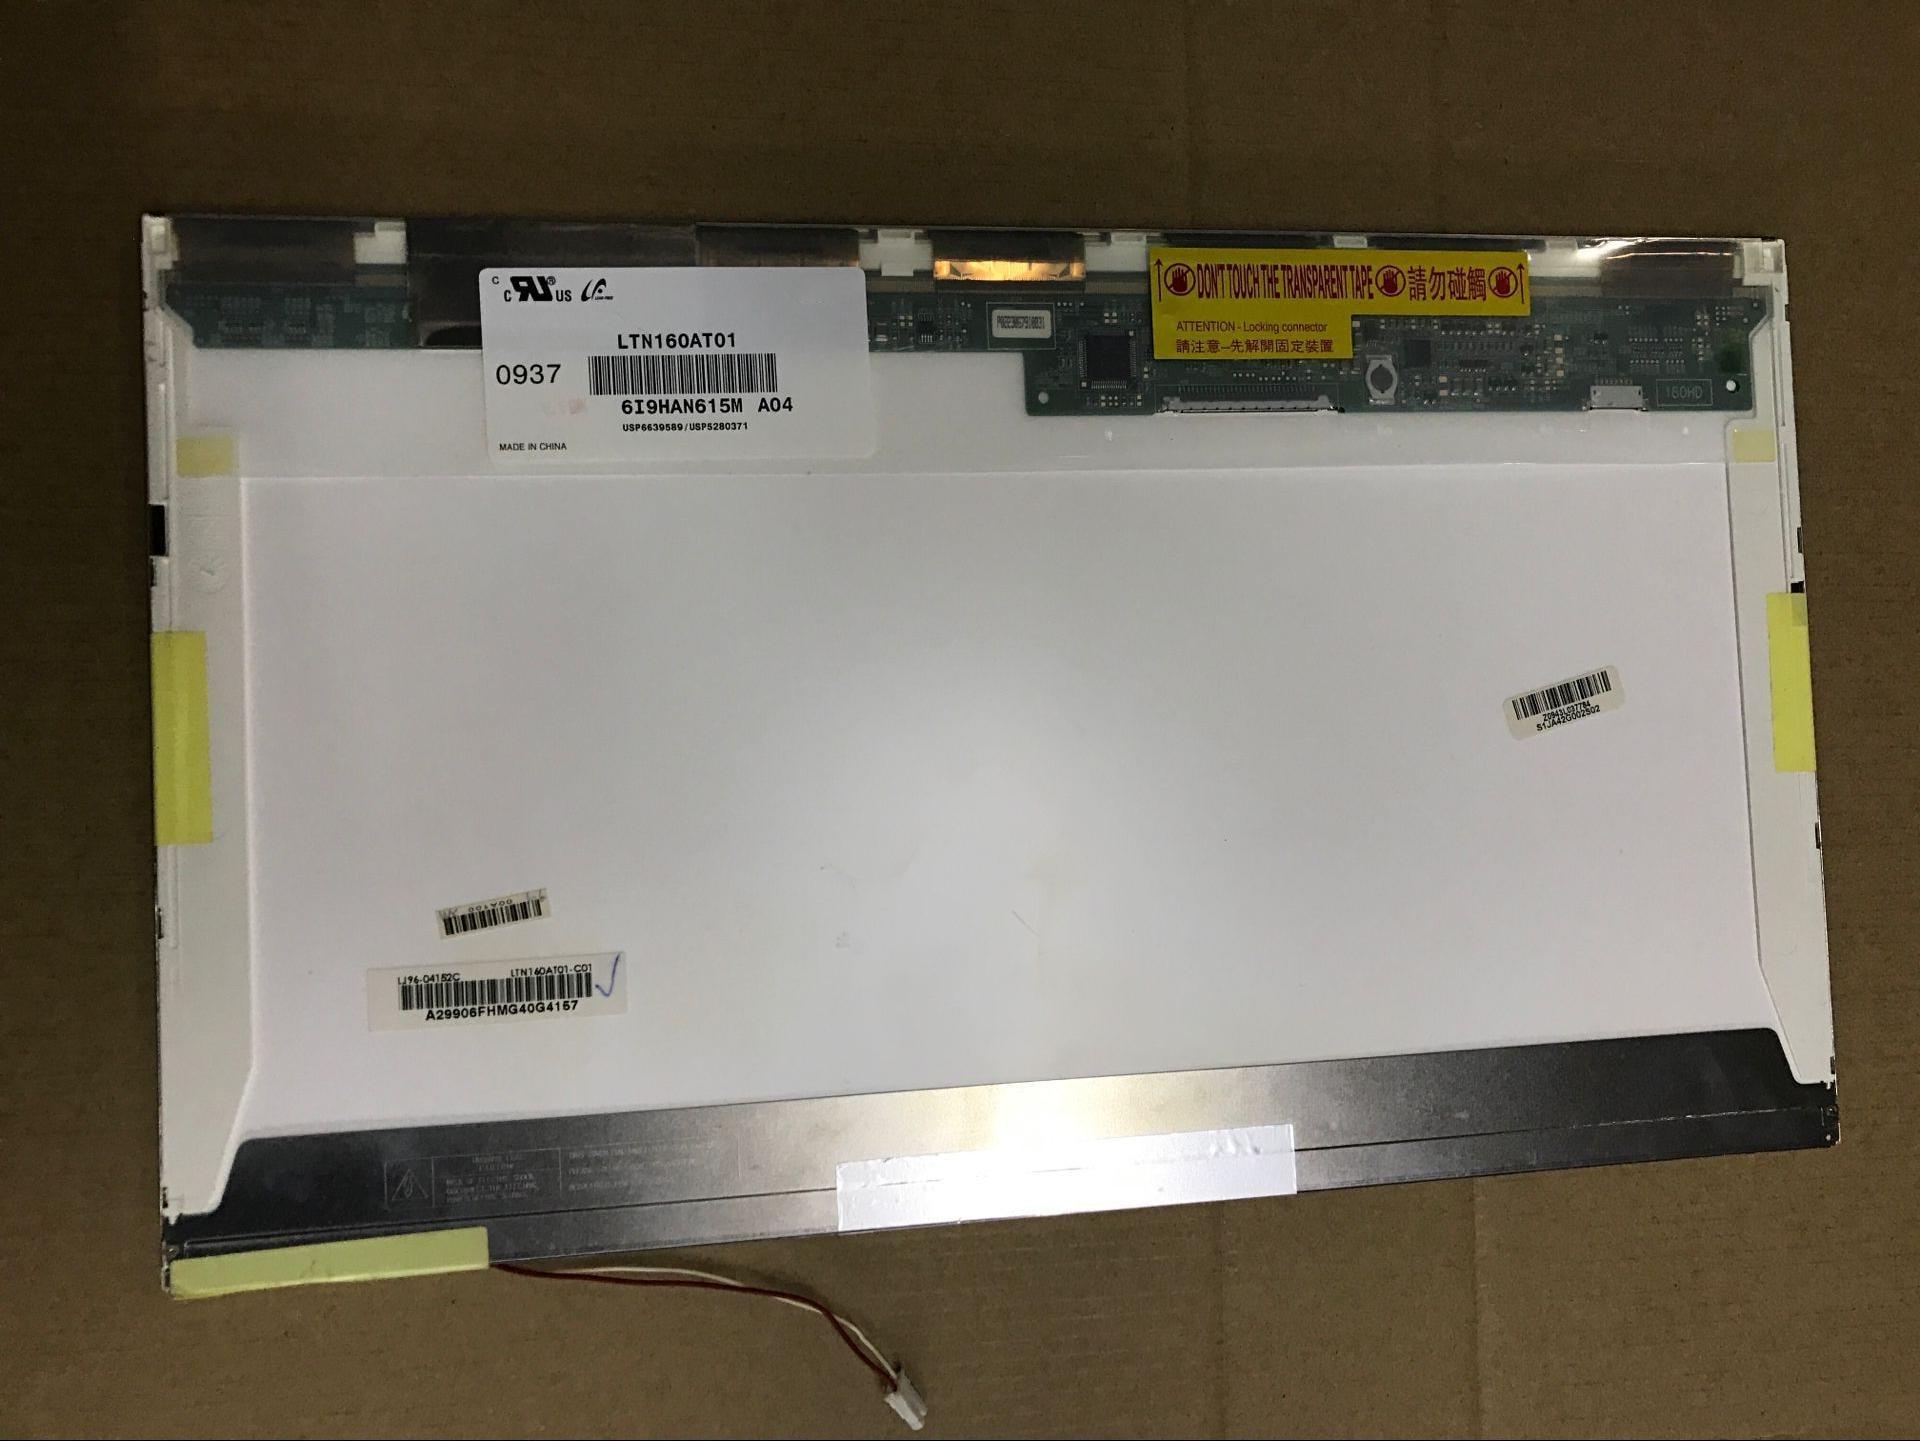 Para Asus X61S Aspire 6930G 6920G 6935 a 6935G forToshiba AX/53HPK CQ60 pantalla LCD de ordenador portátil LTN160AT01 LTN160AT02